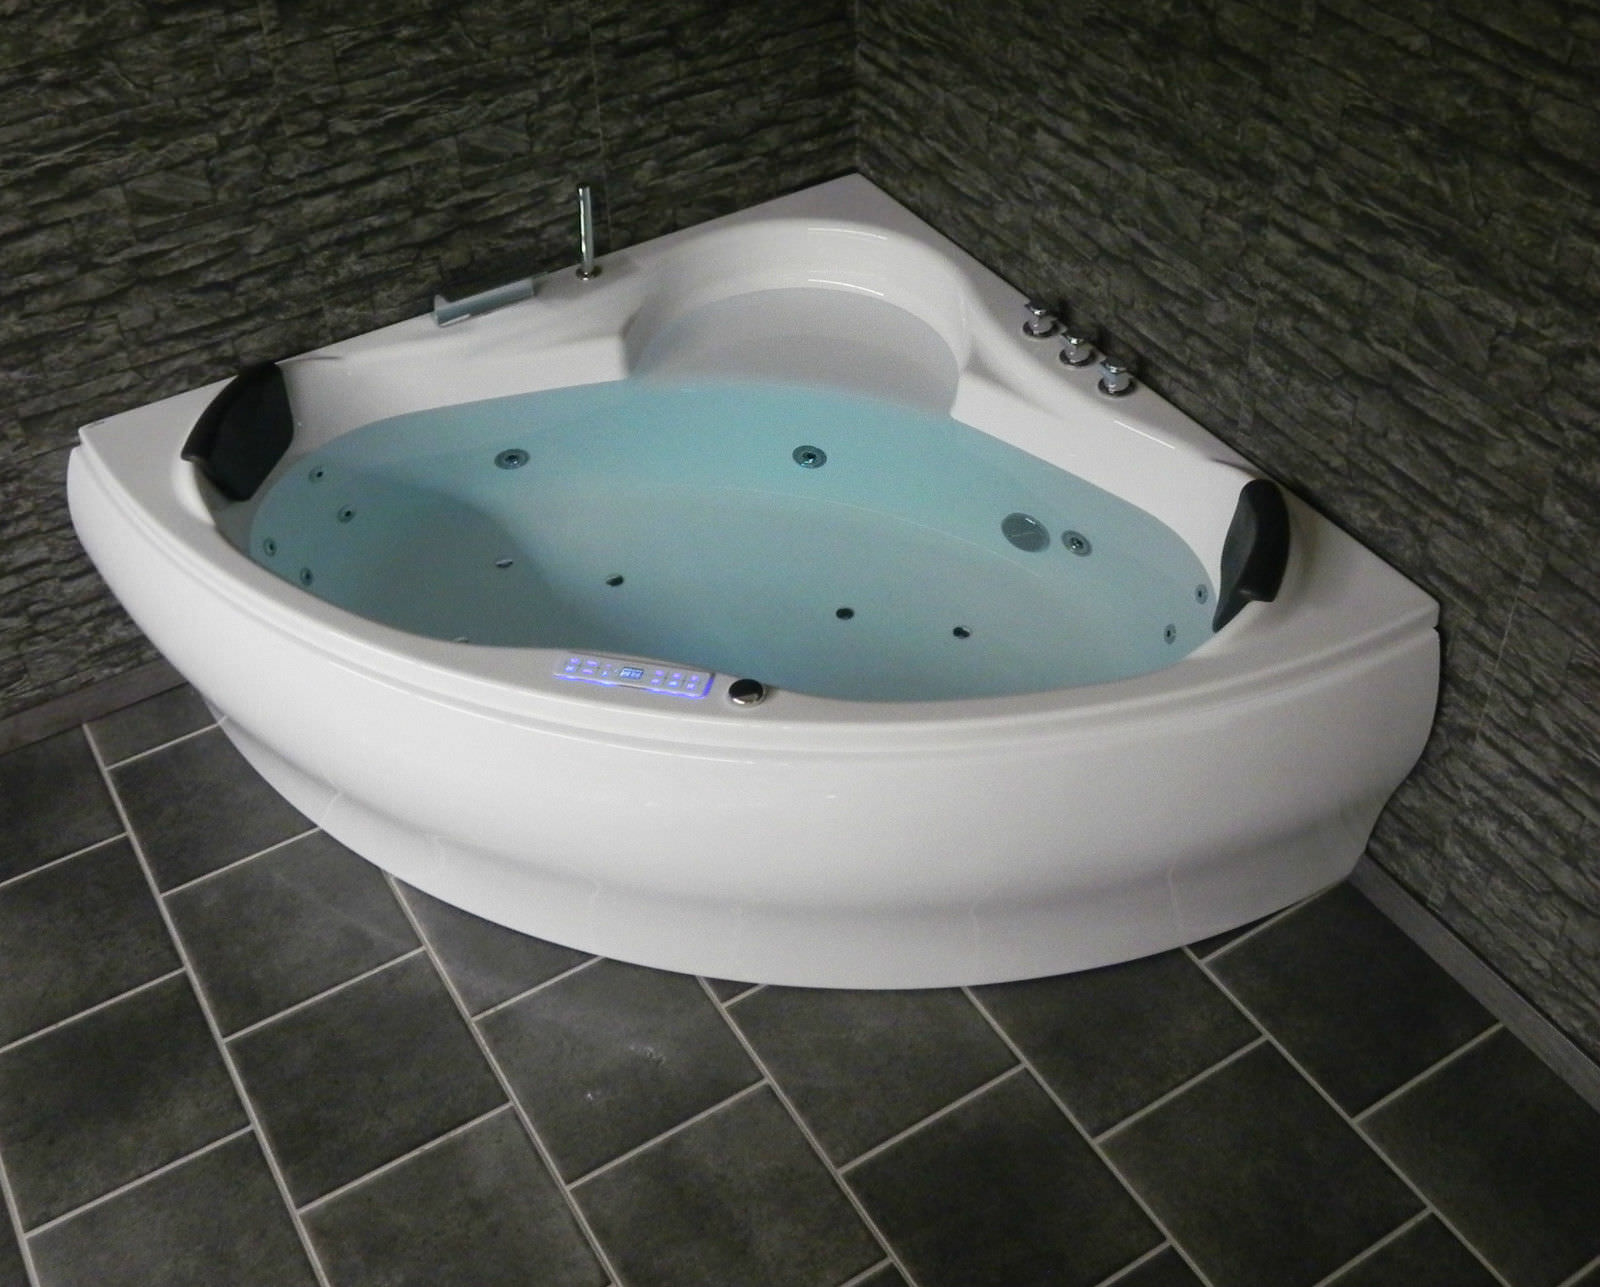 luxus time sanitary ware whirlpool badewanne dina made. Black Bedroom Furniture Sets. Home Design Ideas